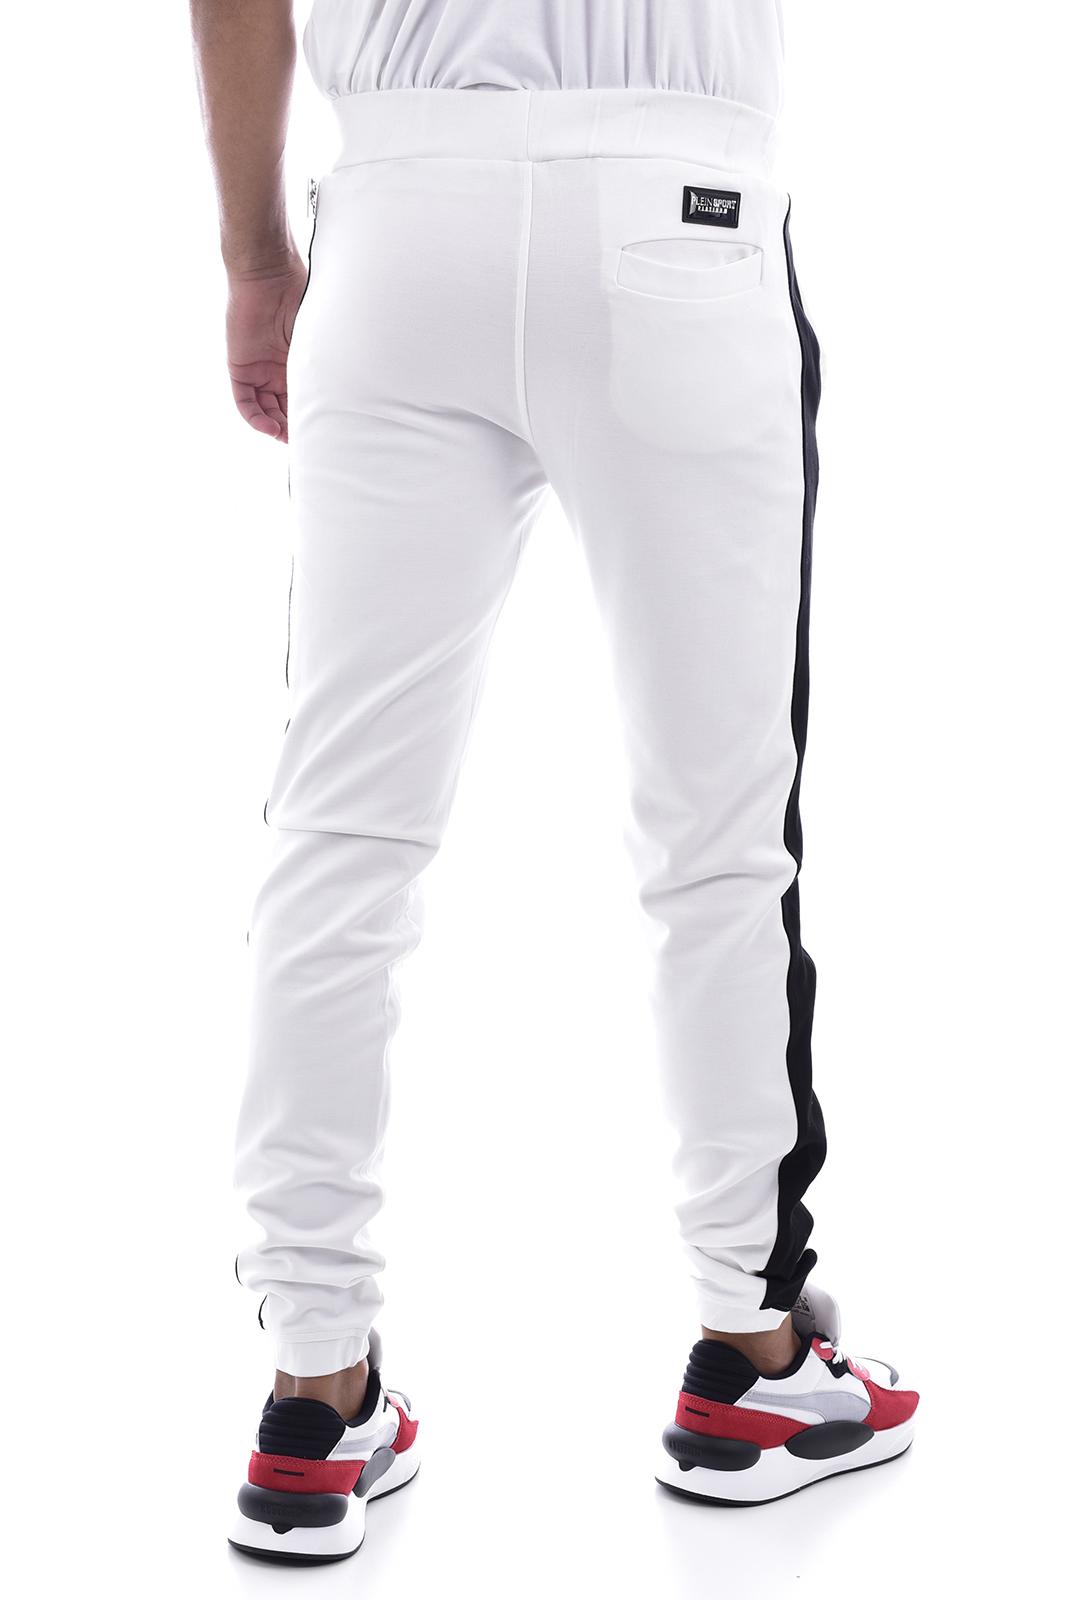 Pantalons sport/streetwear  Plein Sport MJT0681 WHITE